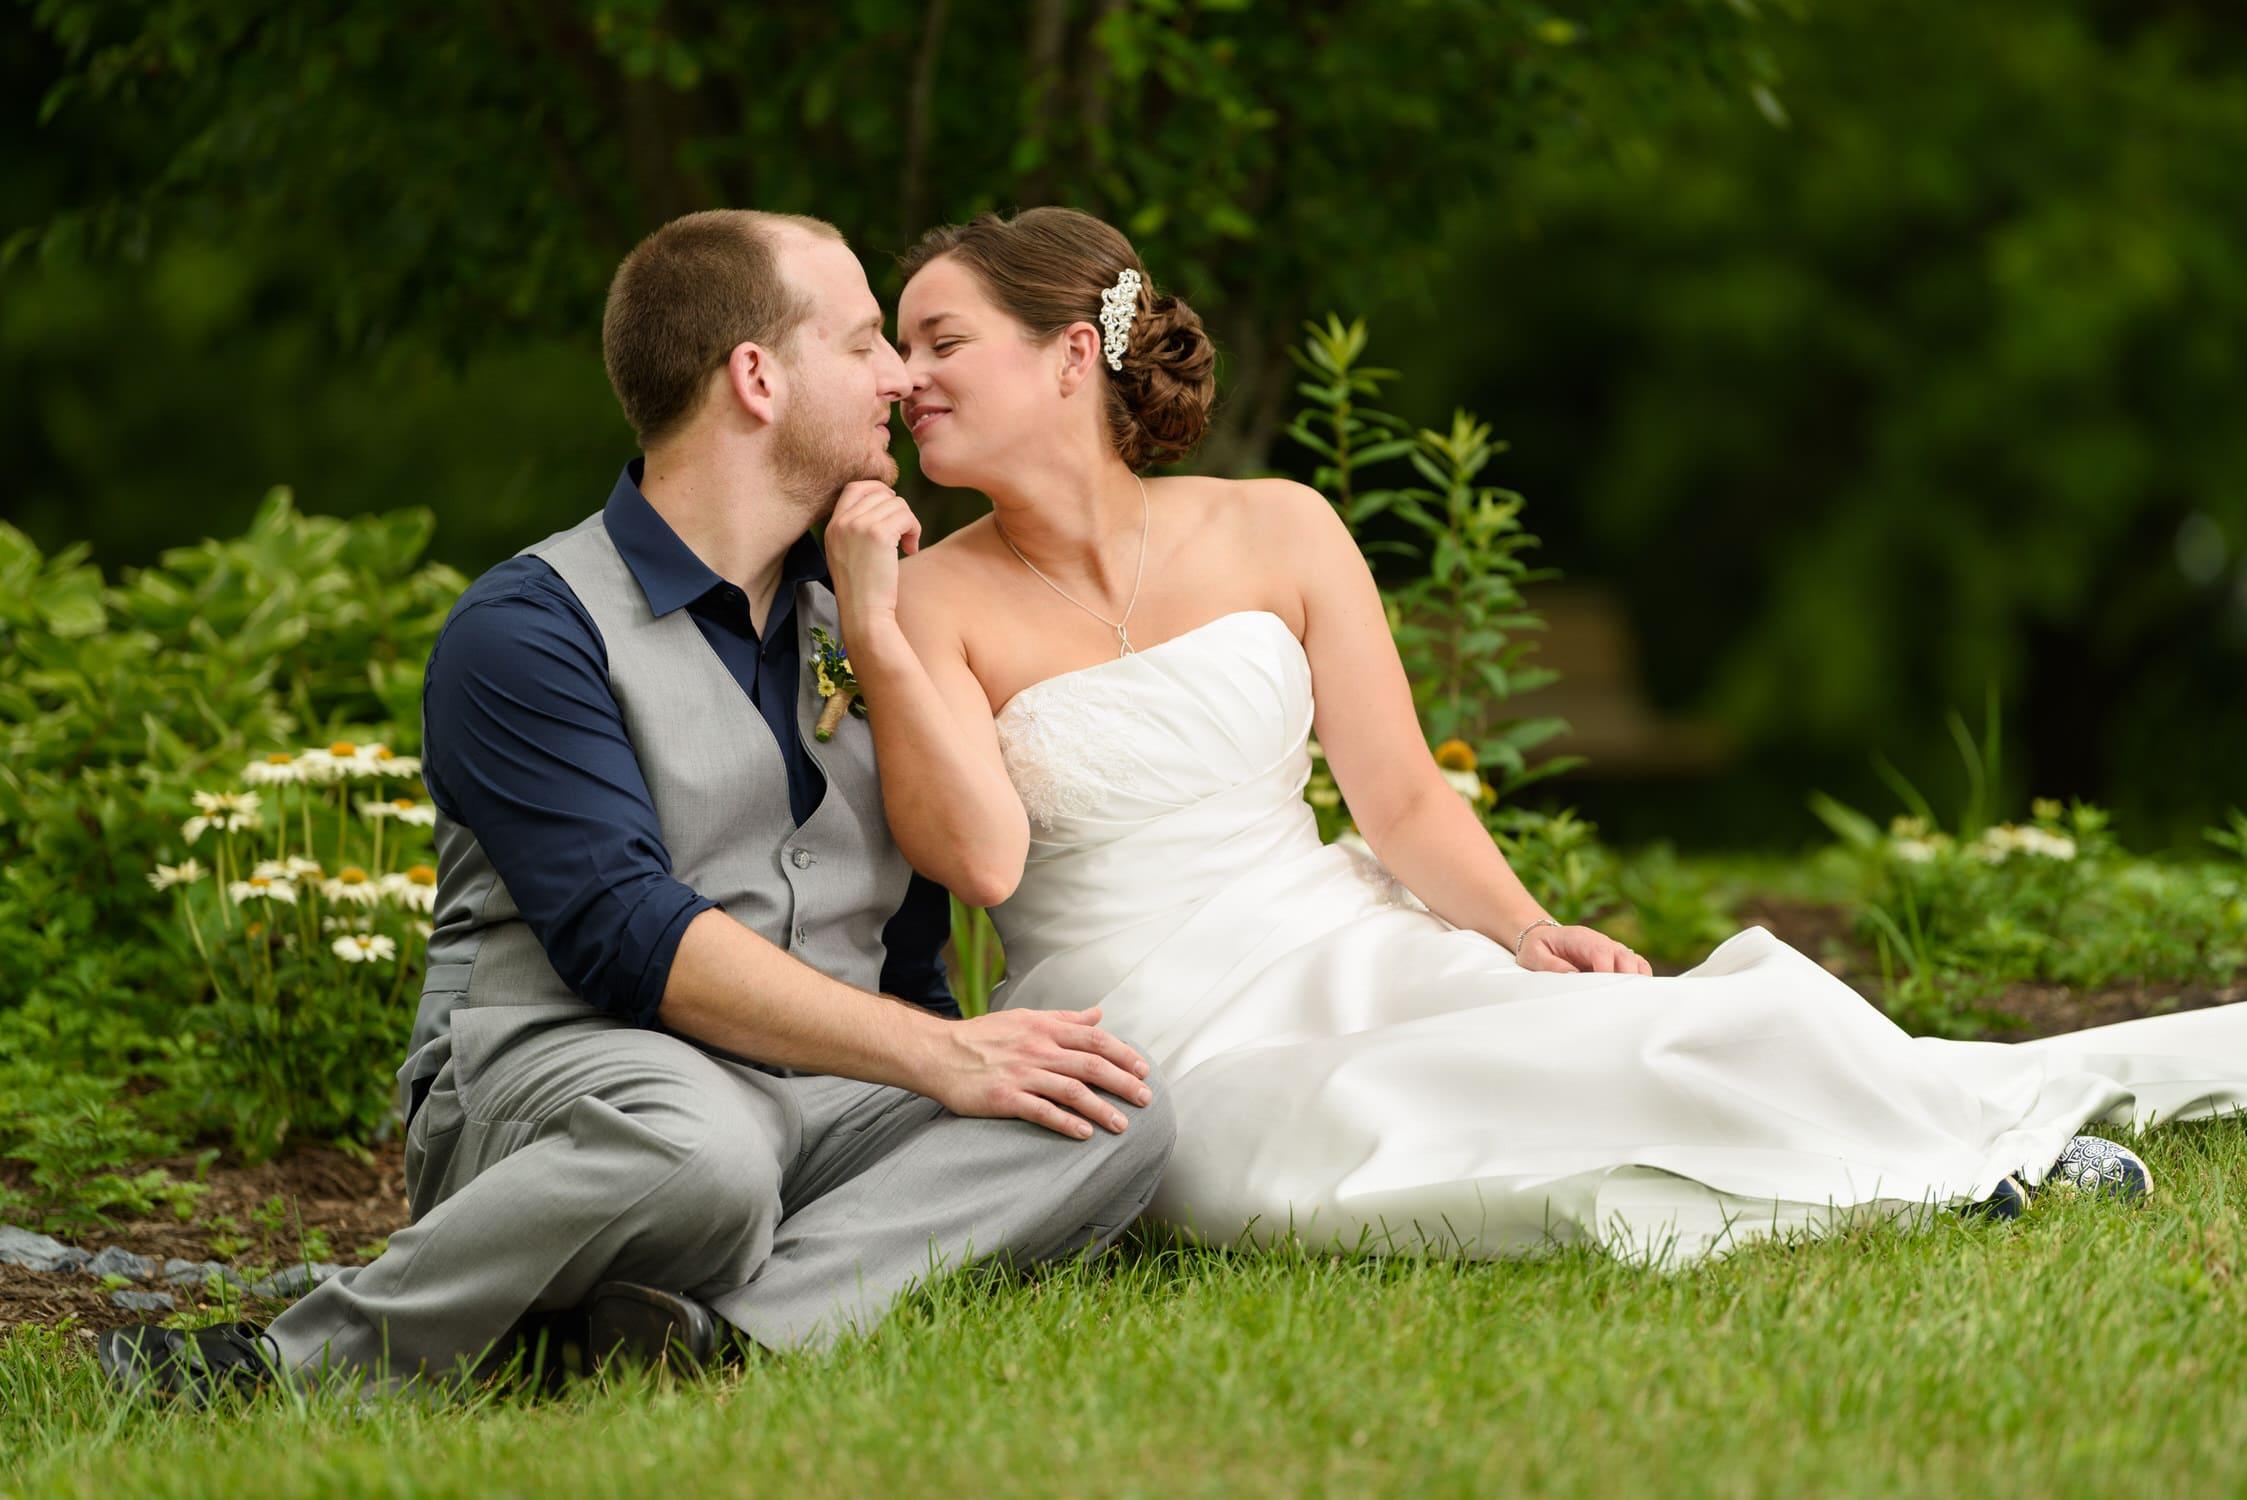 Romantic Wedding Photography Pennsylvania